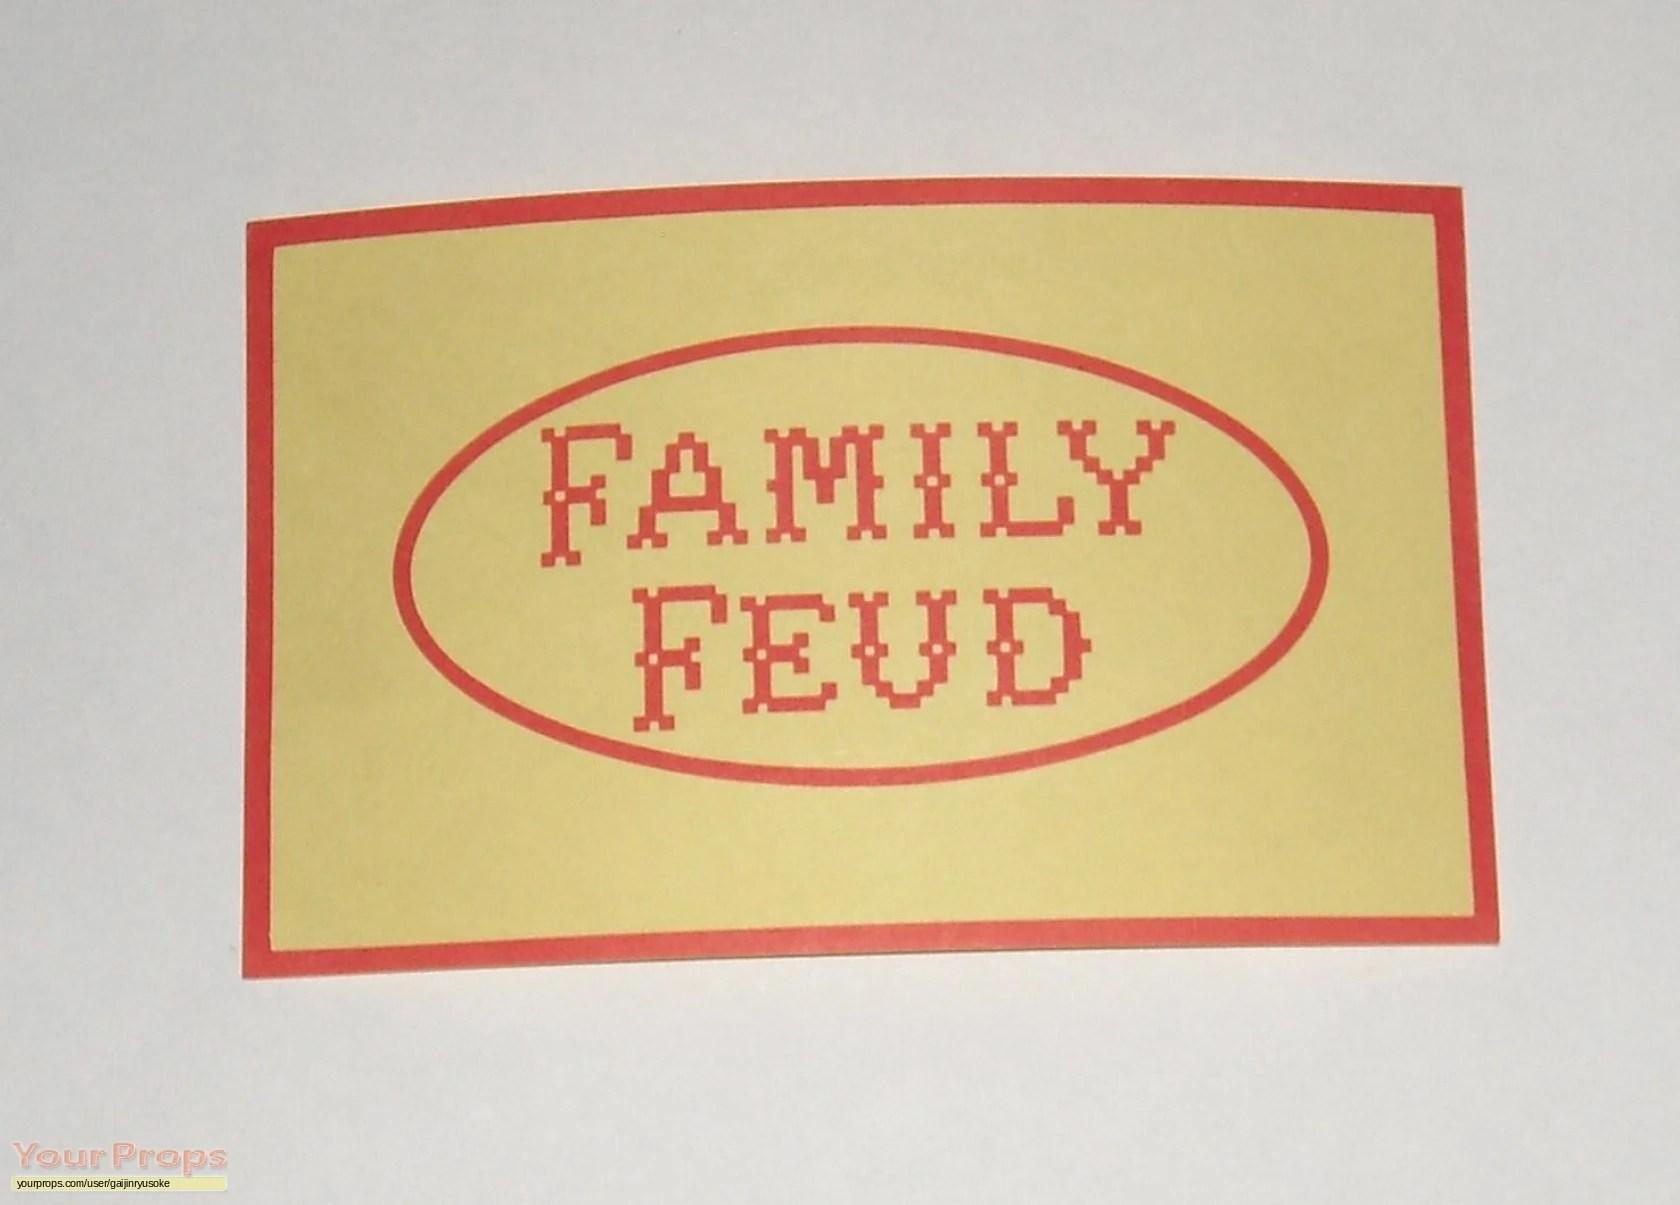 Image Family Feud TV 1988 Movie Propsjpg Mark Goodson